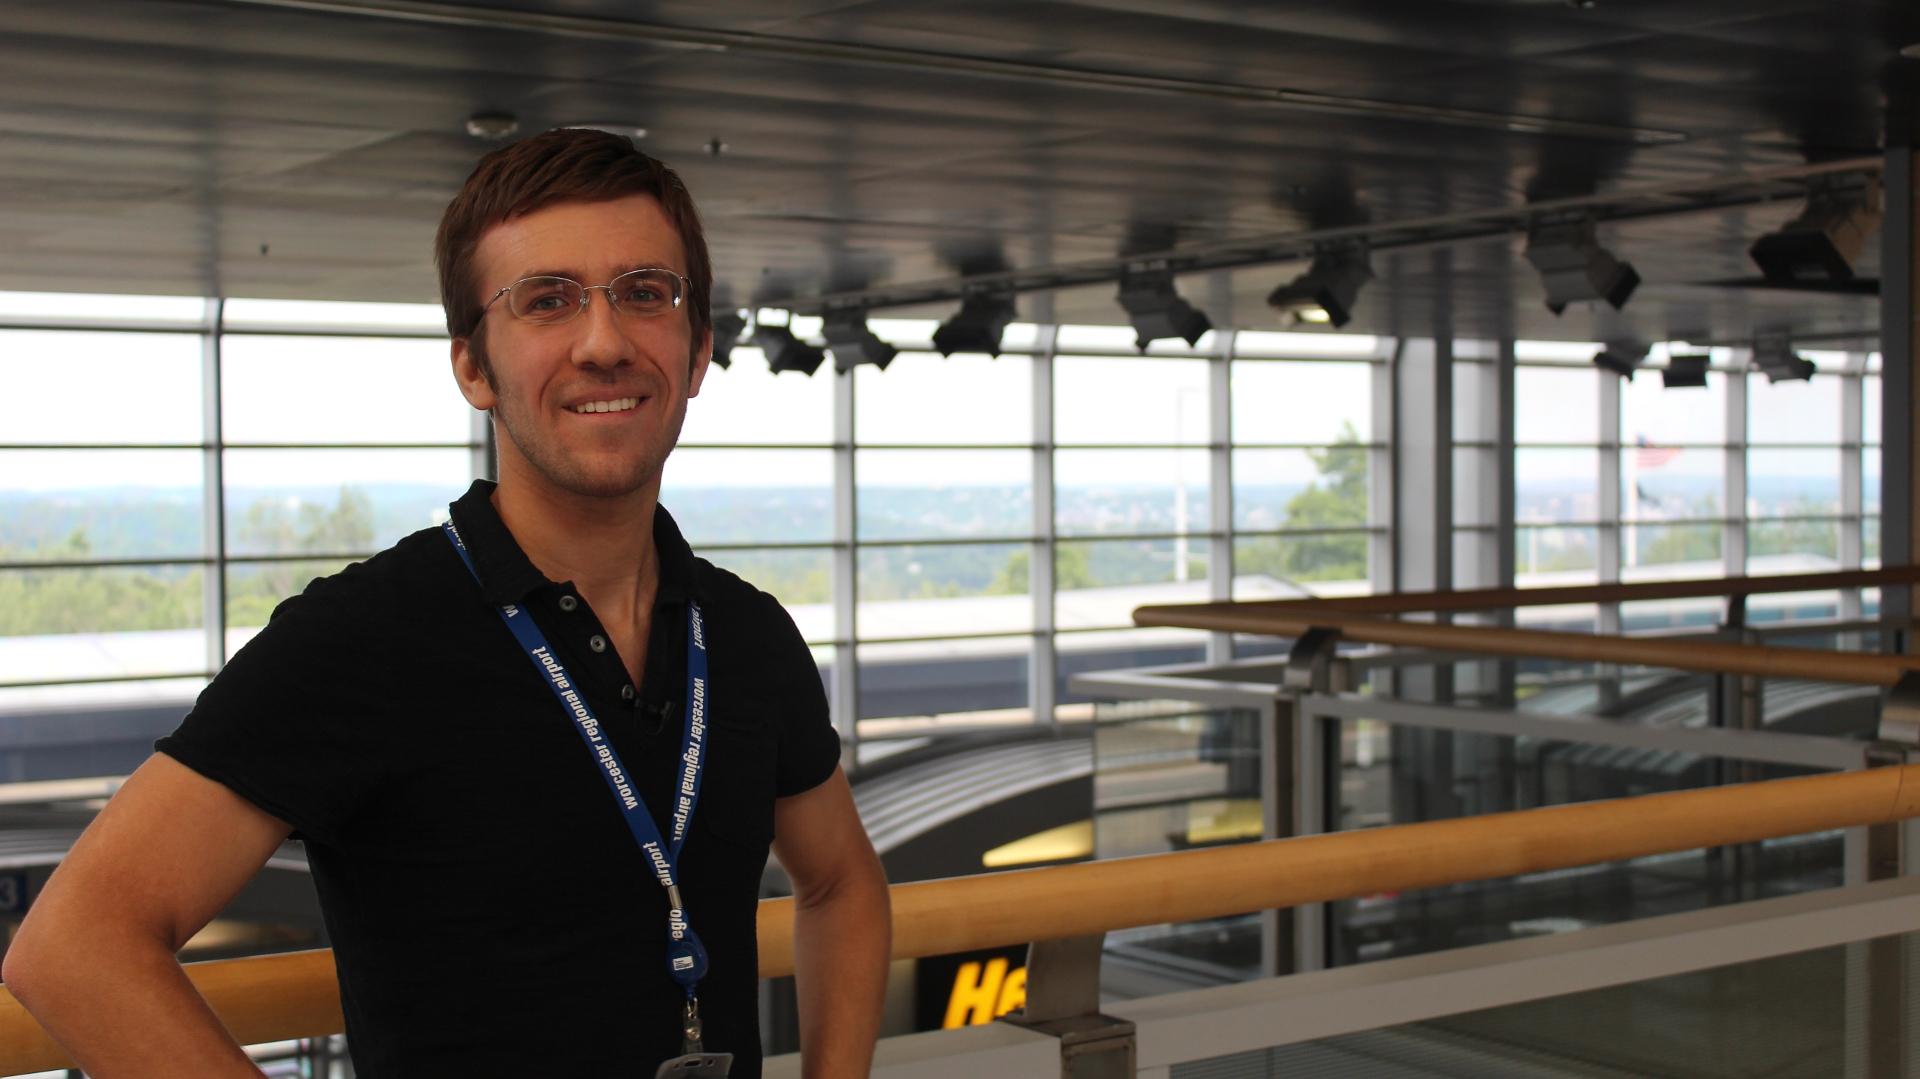 Nicholas Nick Cyganski